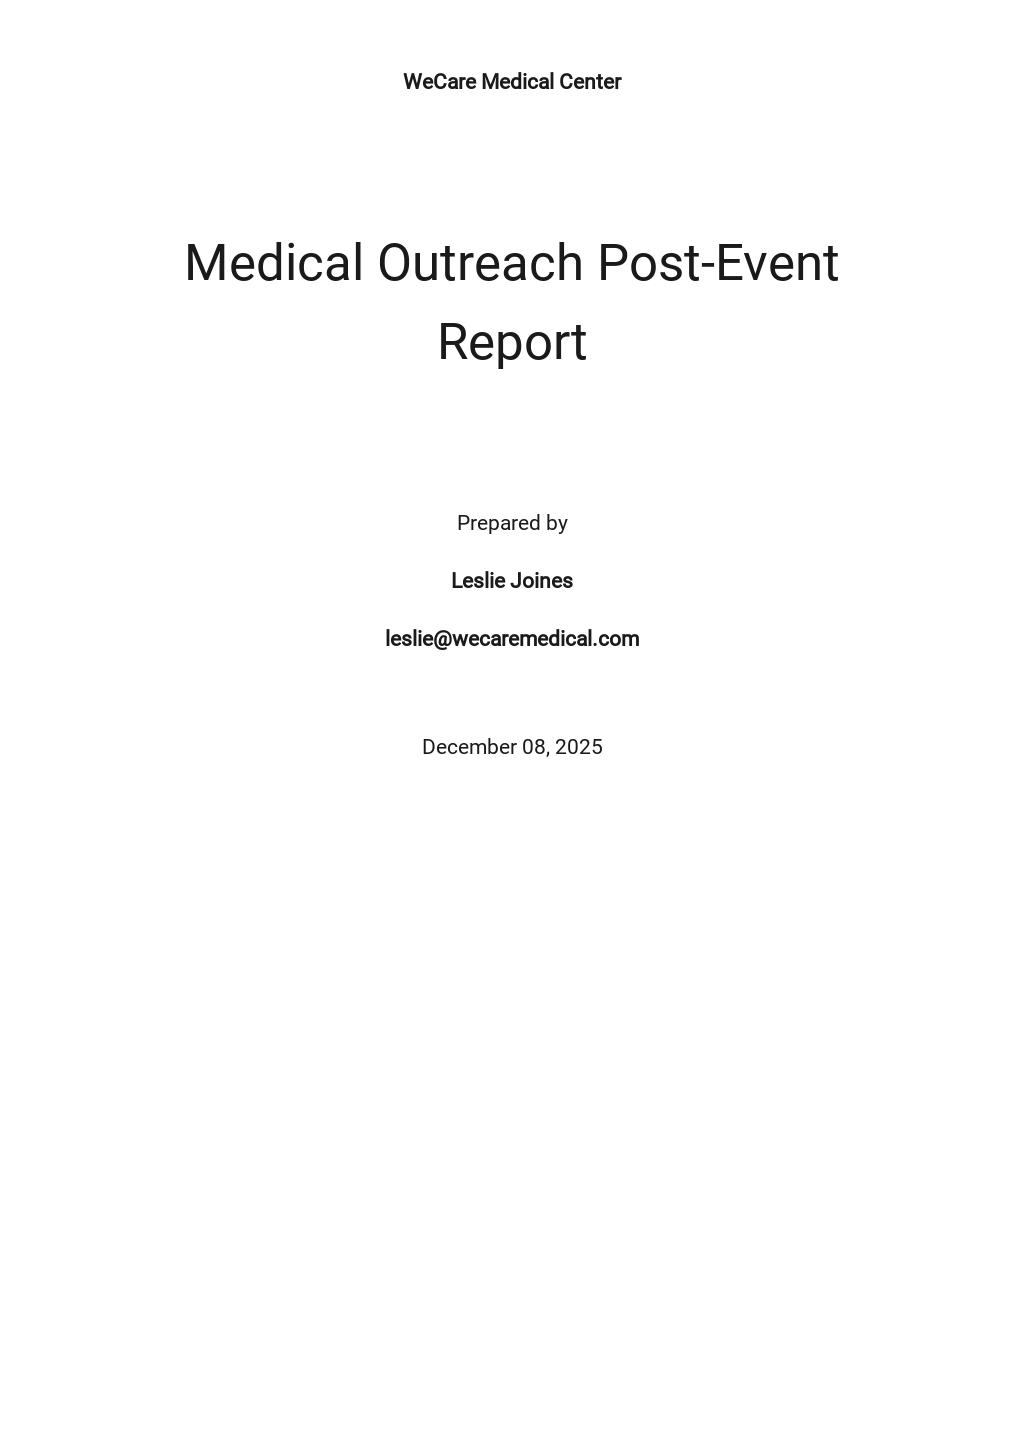 Post Event Report Template.jpe